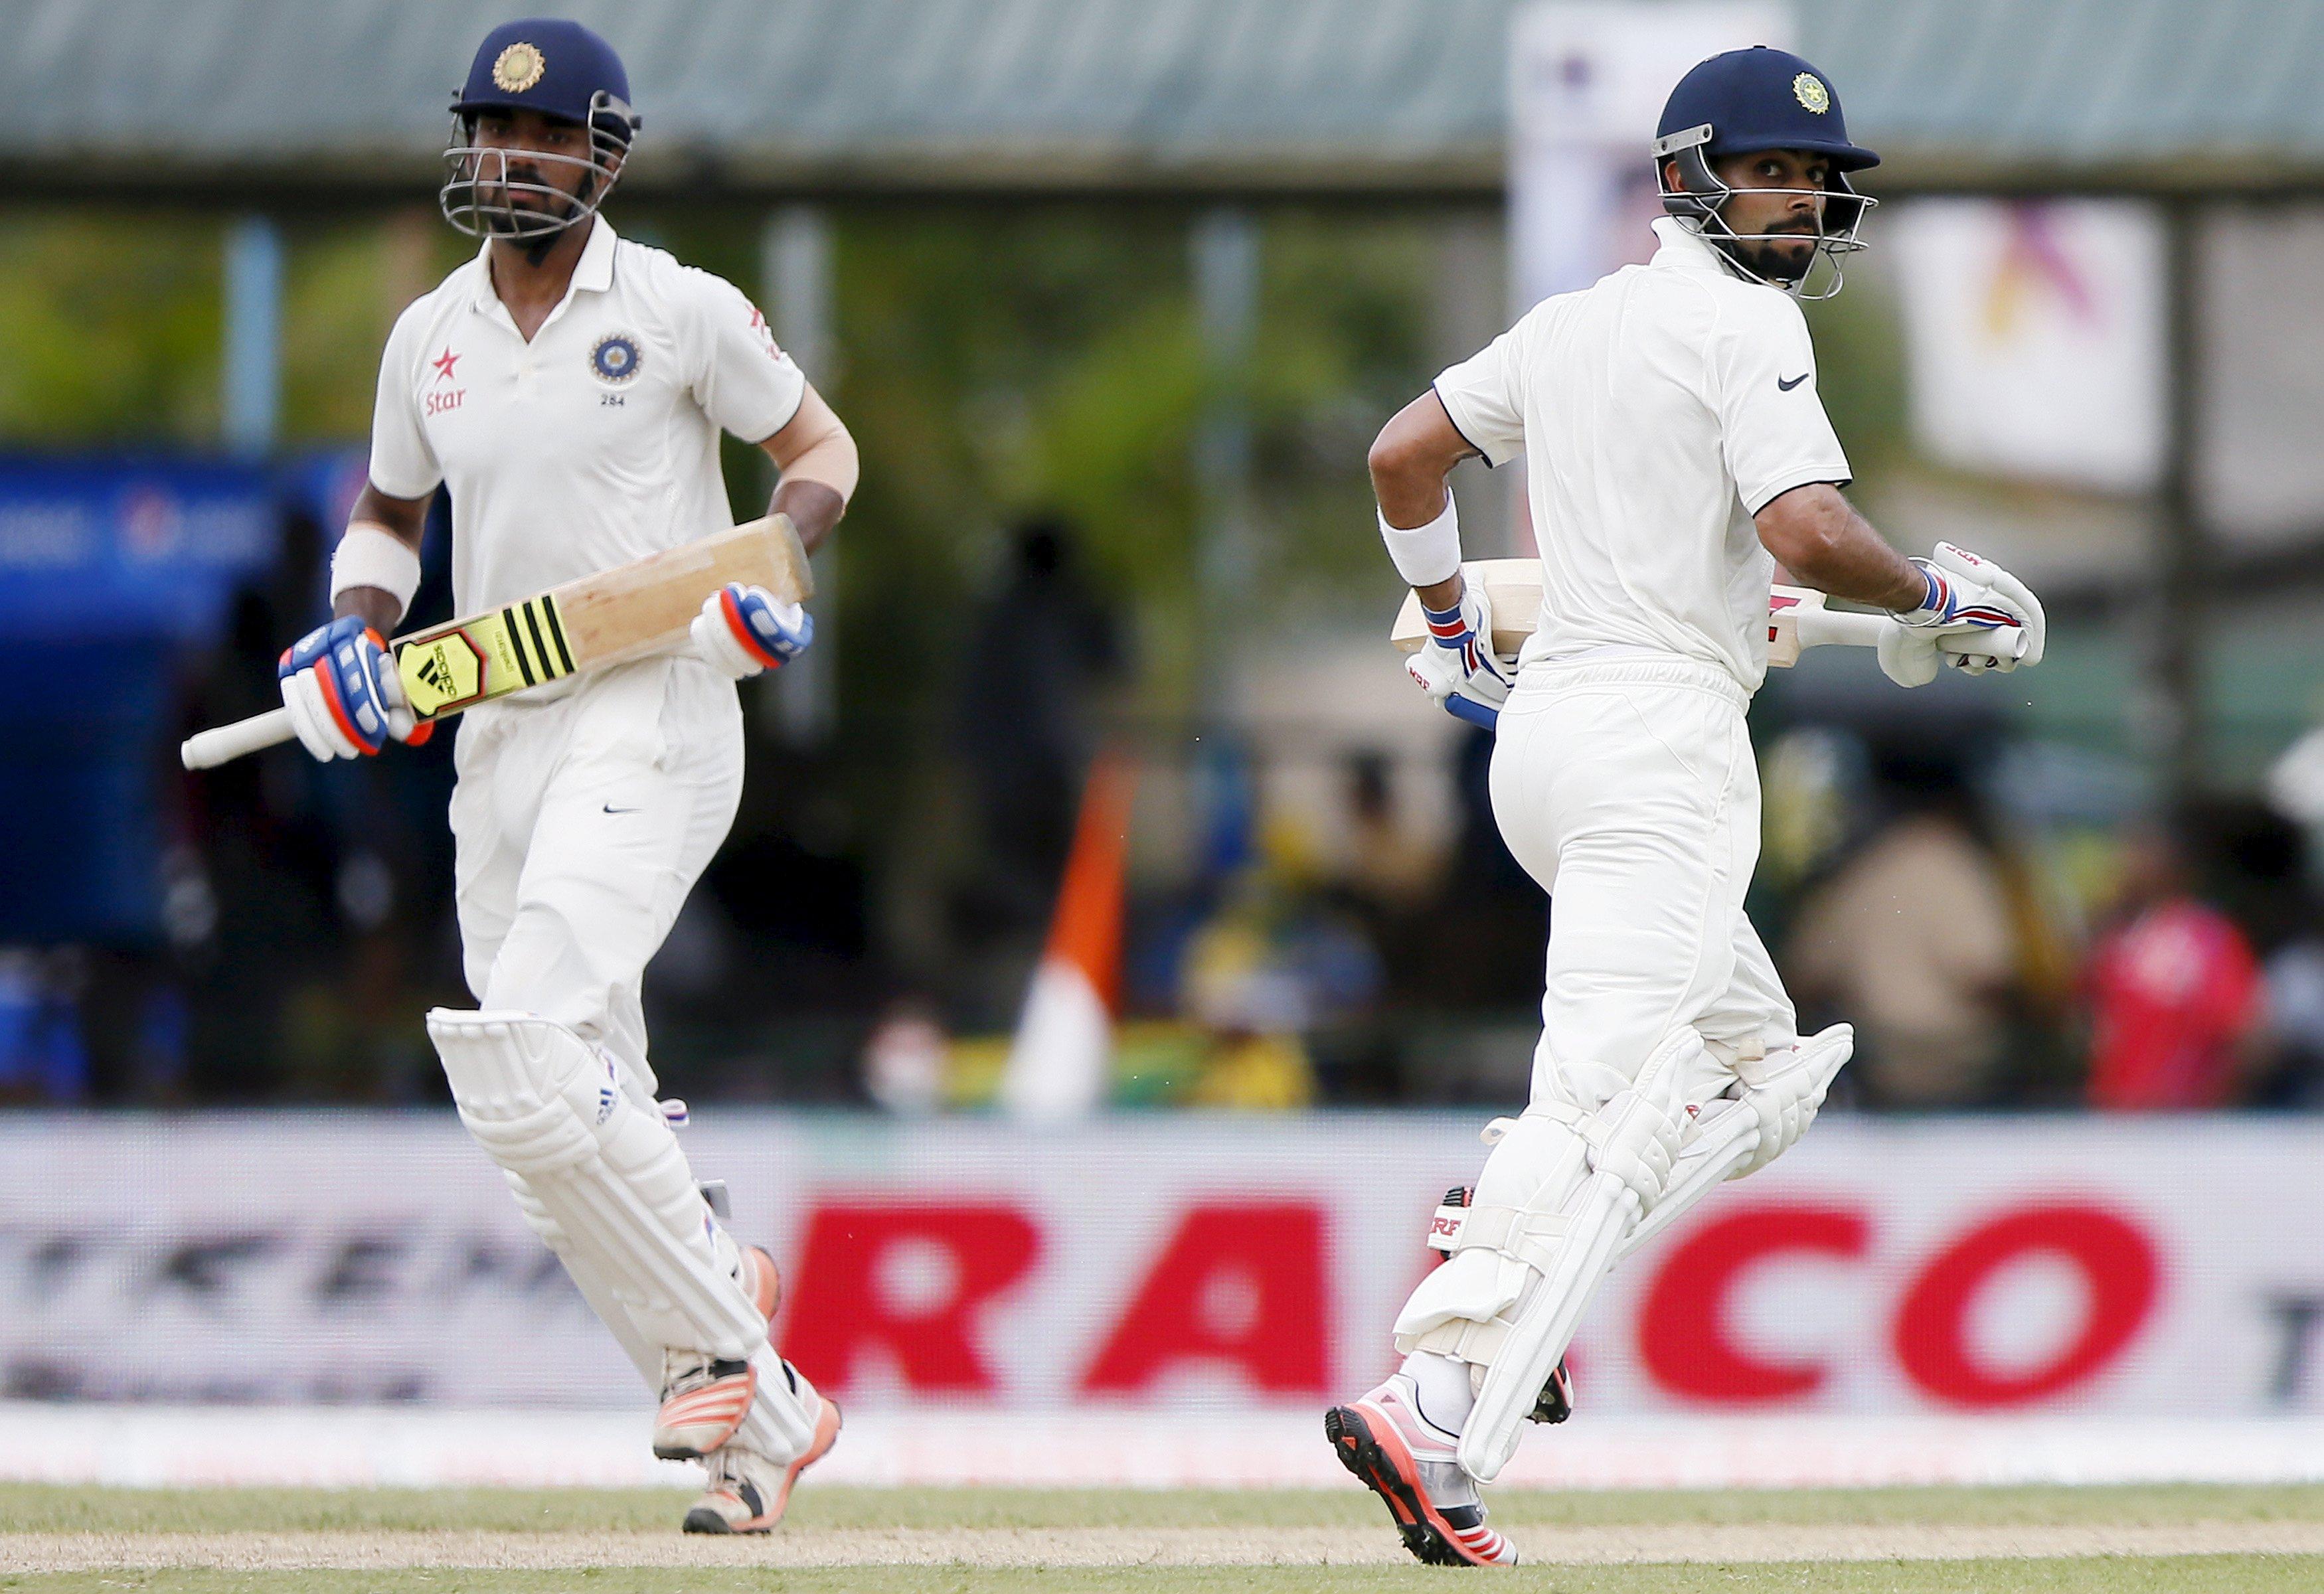 India's captain Virat Kohli (R) and Lokesh Rahul